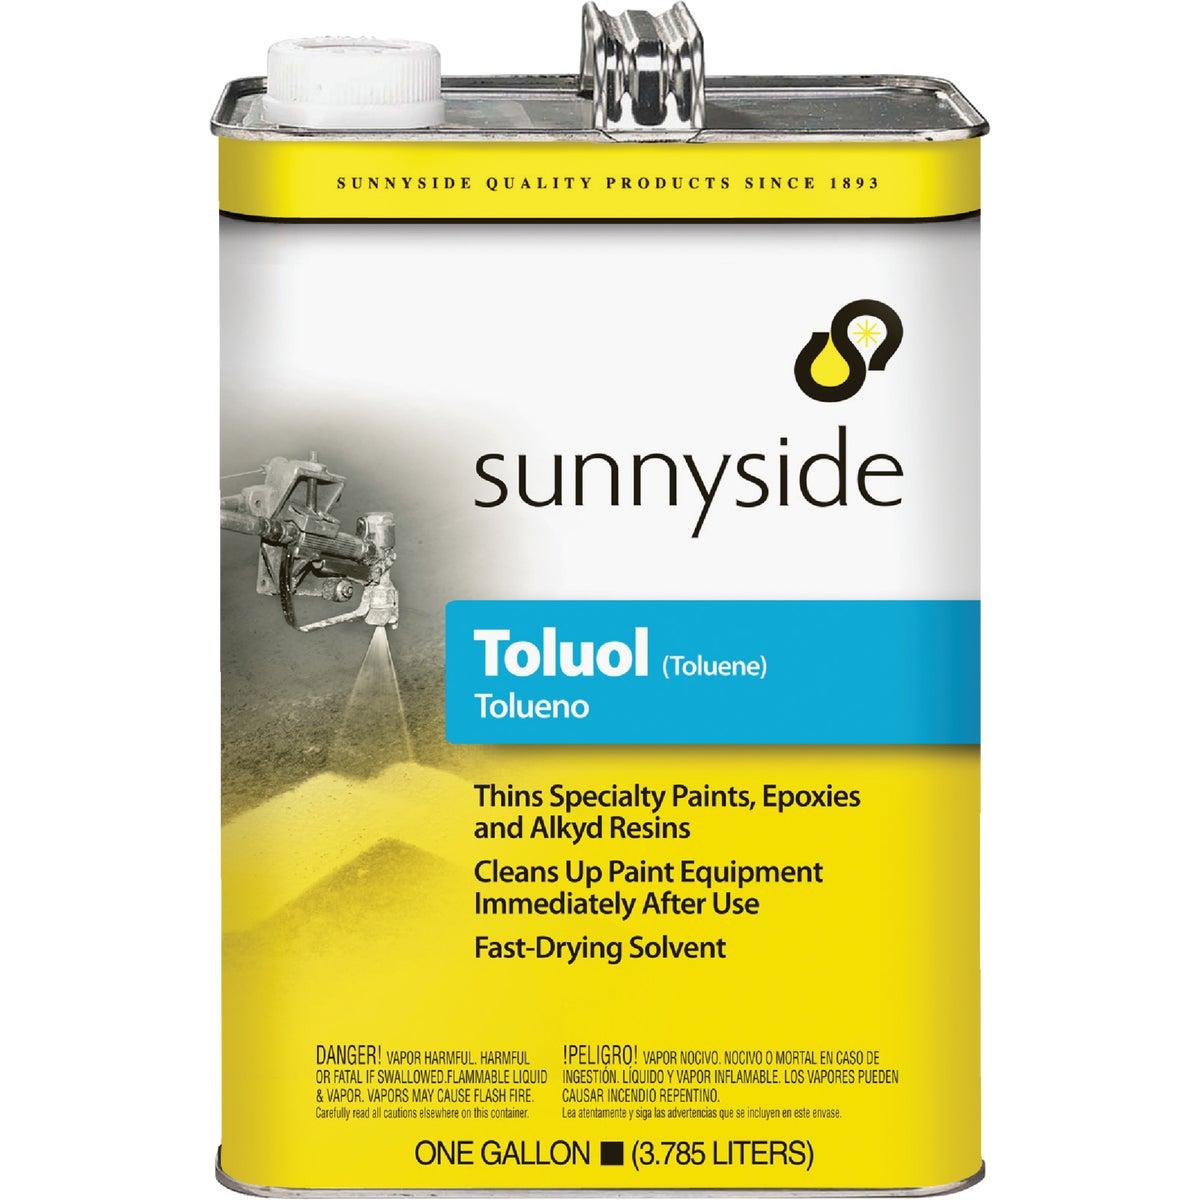 TOLUOL (TOULUENE) - 821G1 by Sunnyside Corp